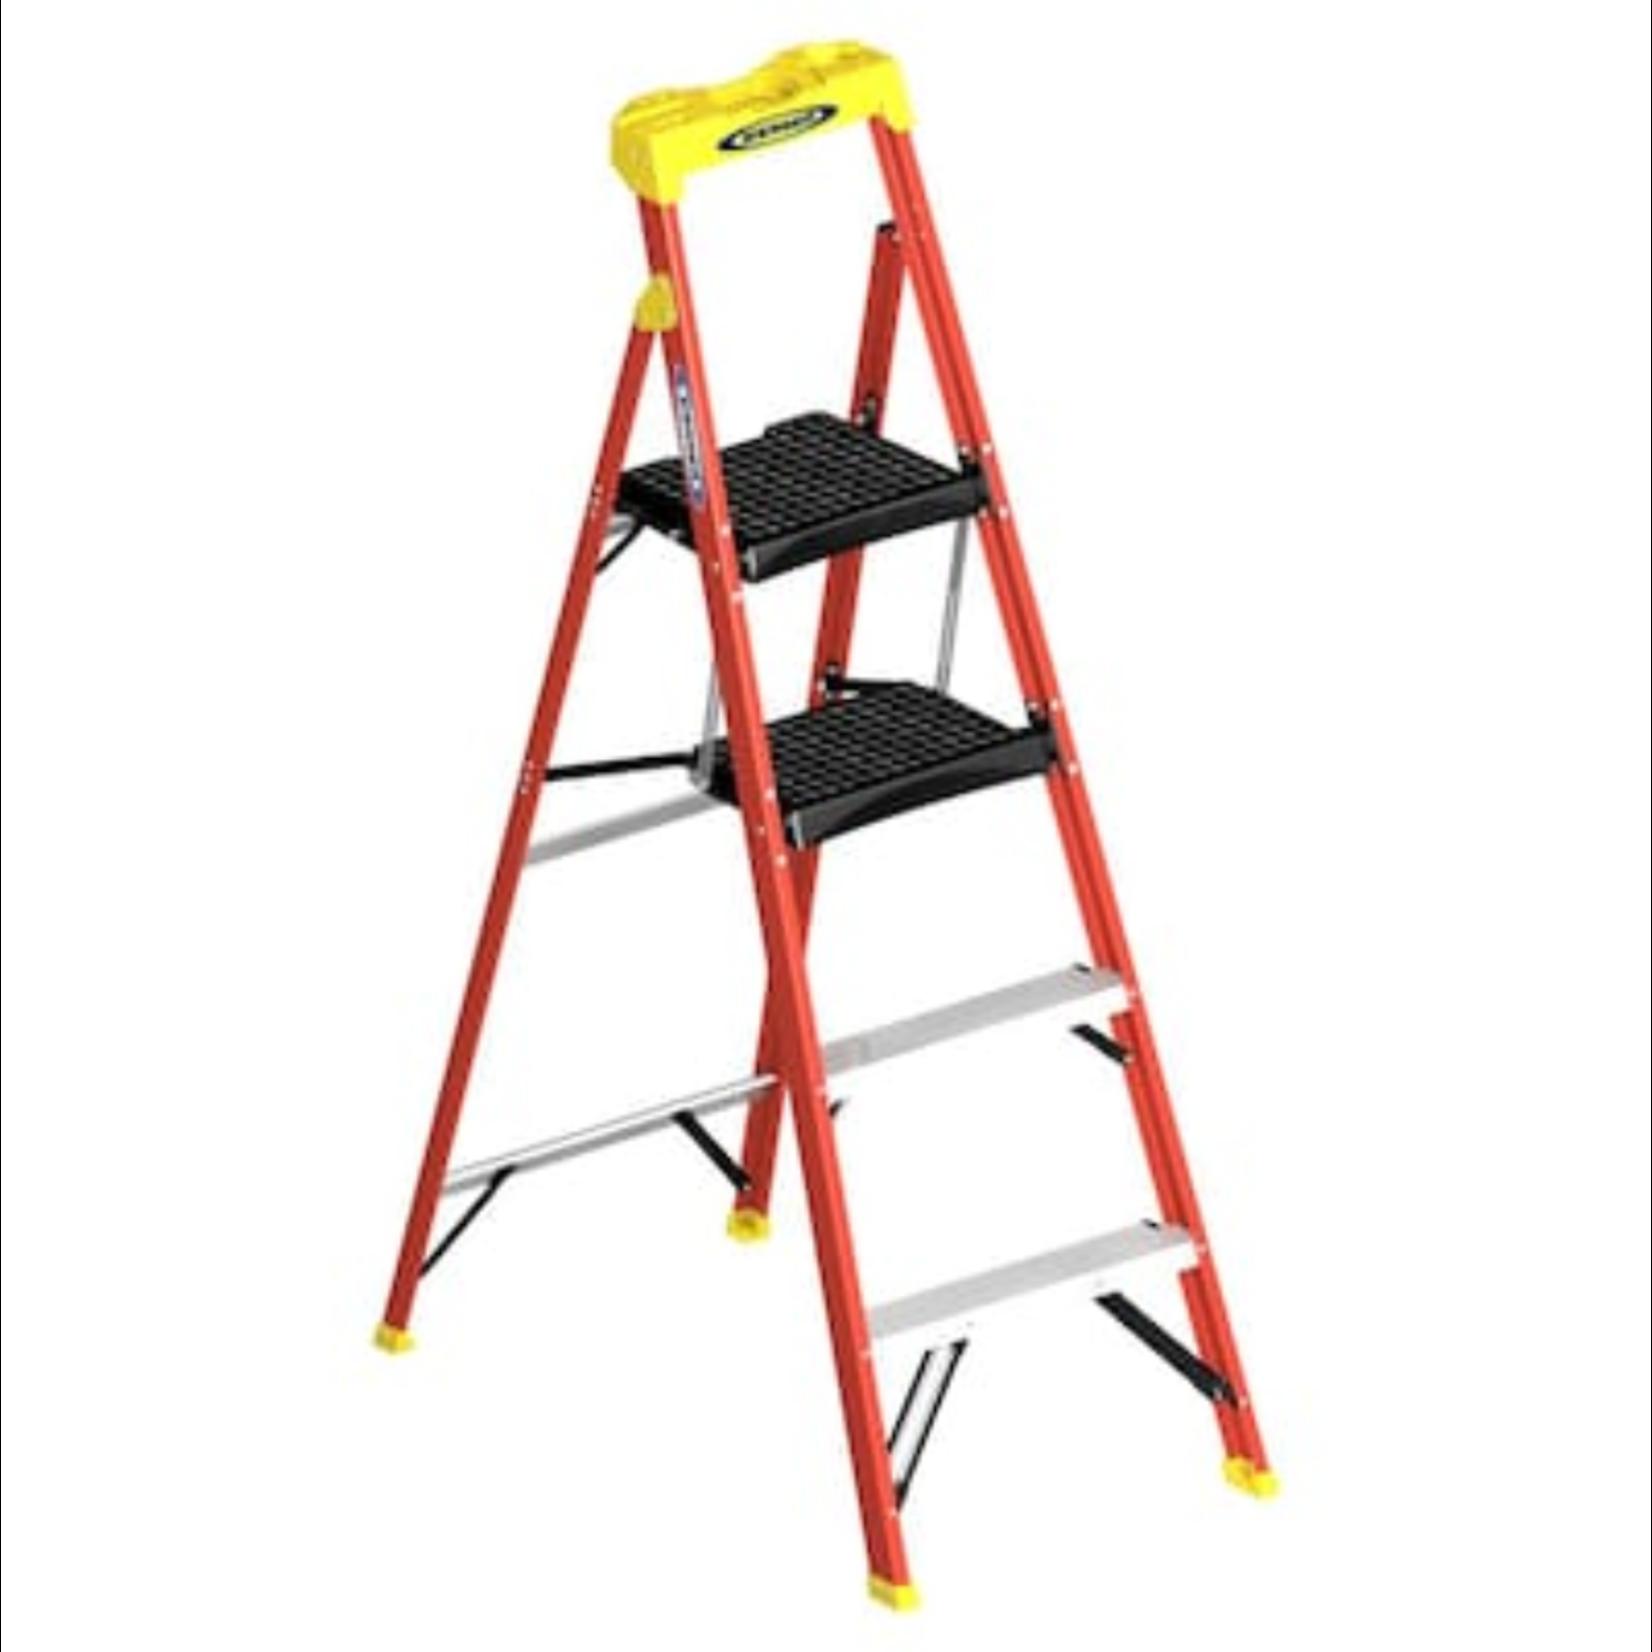 10251 Werner 5-1/2-ft Fiberglass Podium Step Ladder